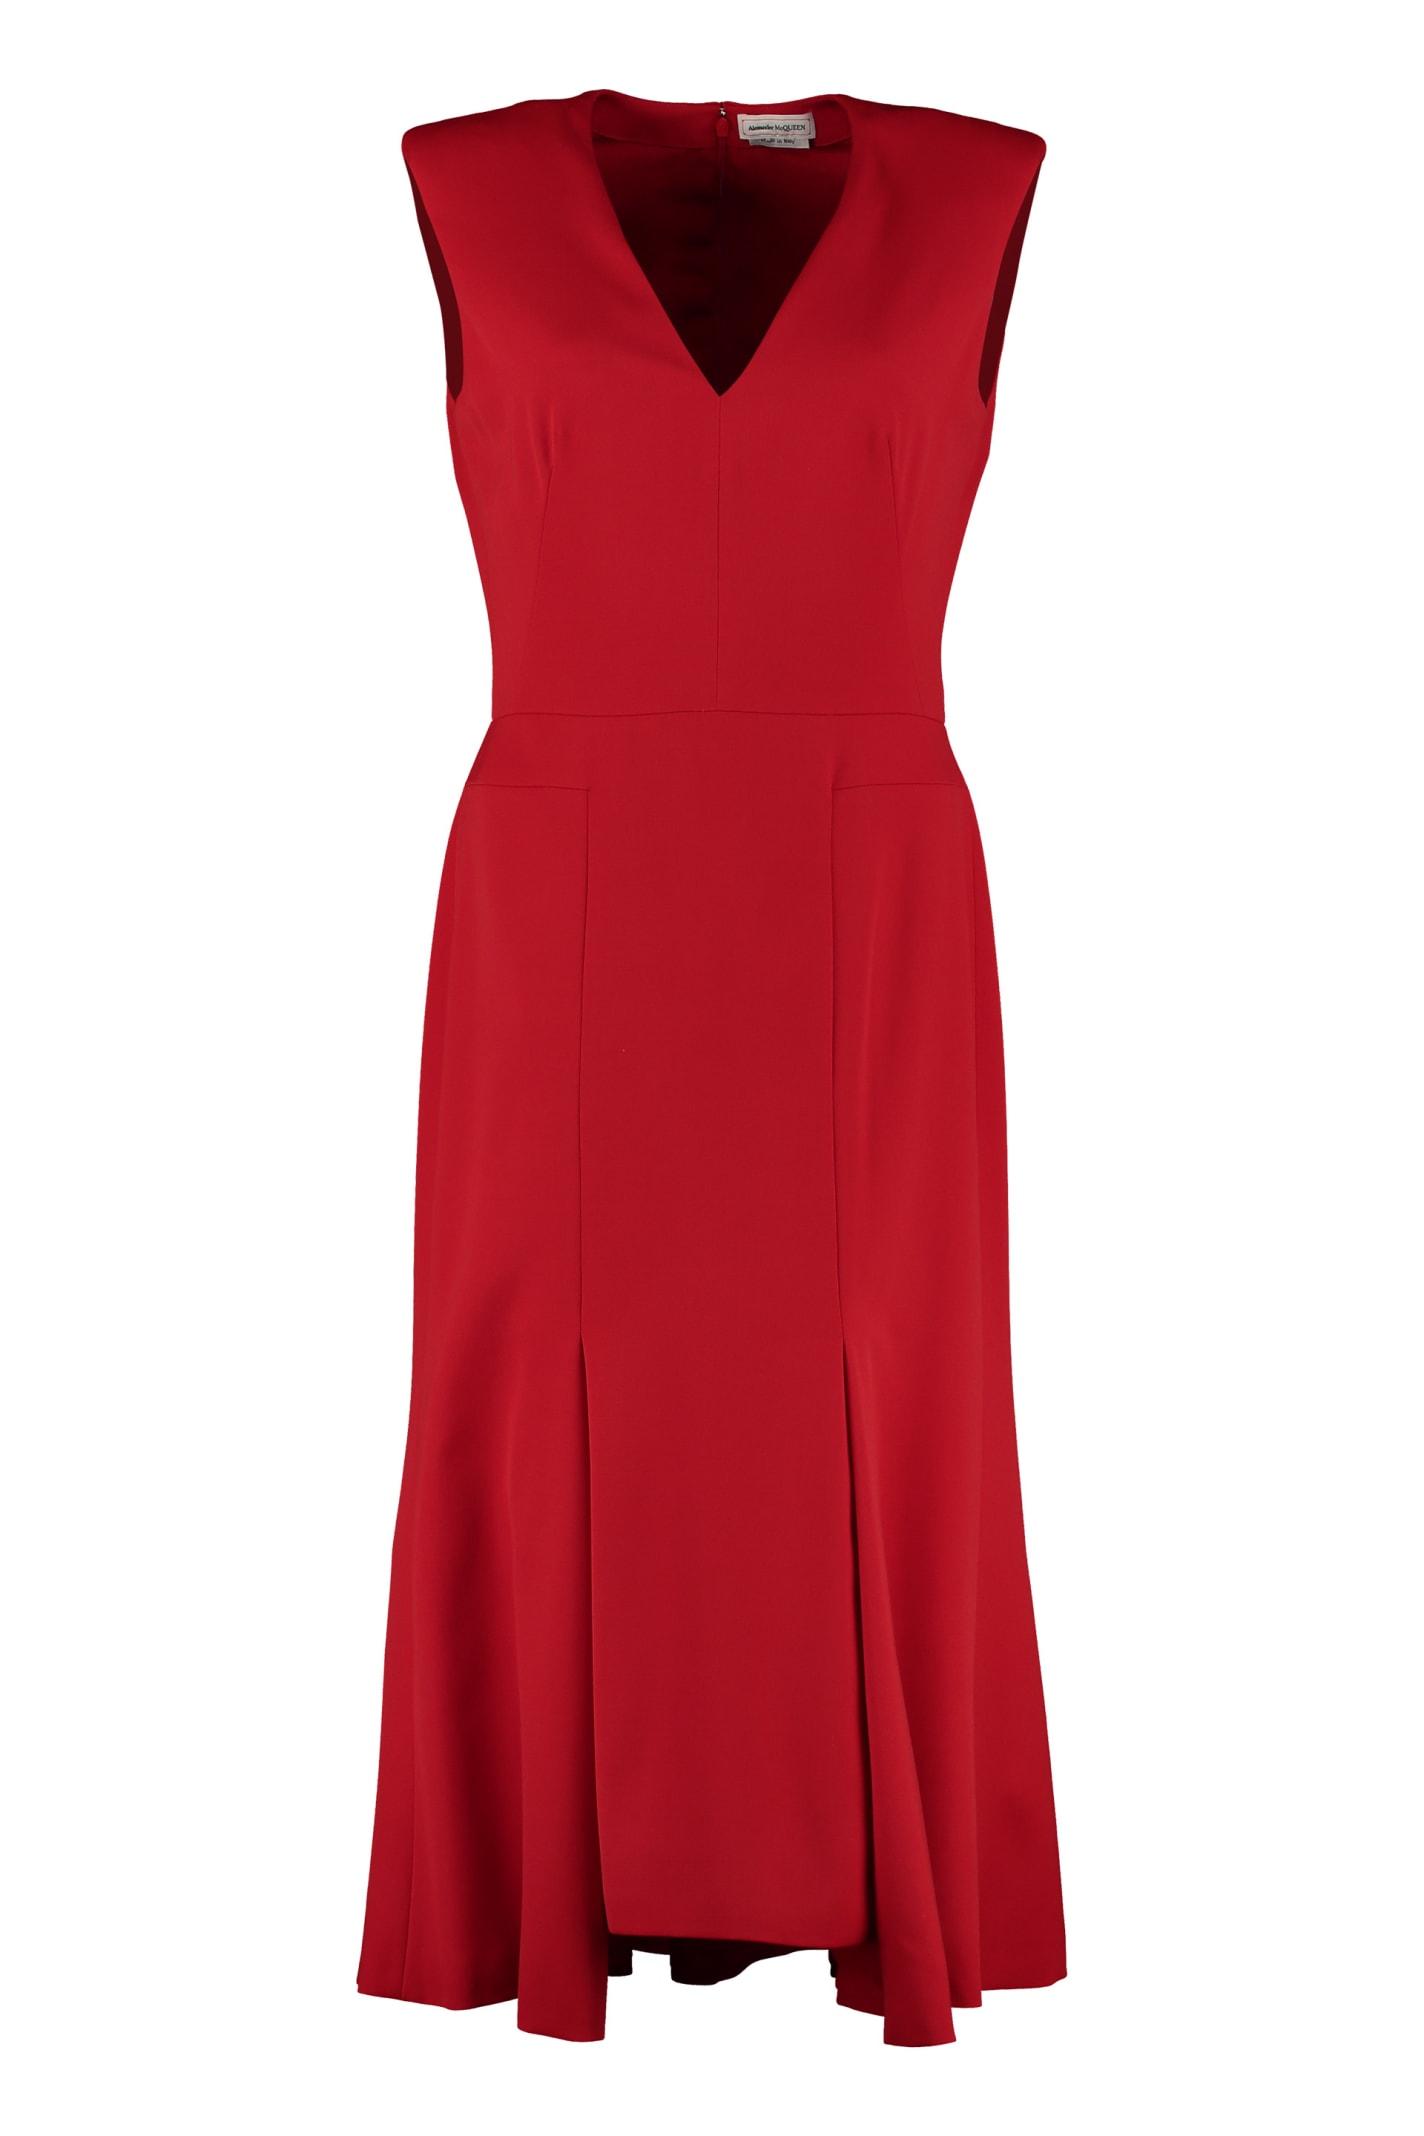 Alexander McQueen Virgin Wool Midi Dress